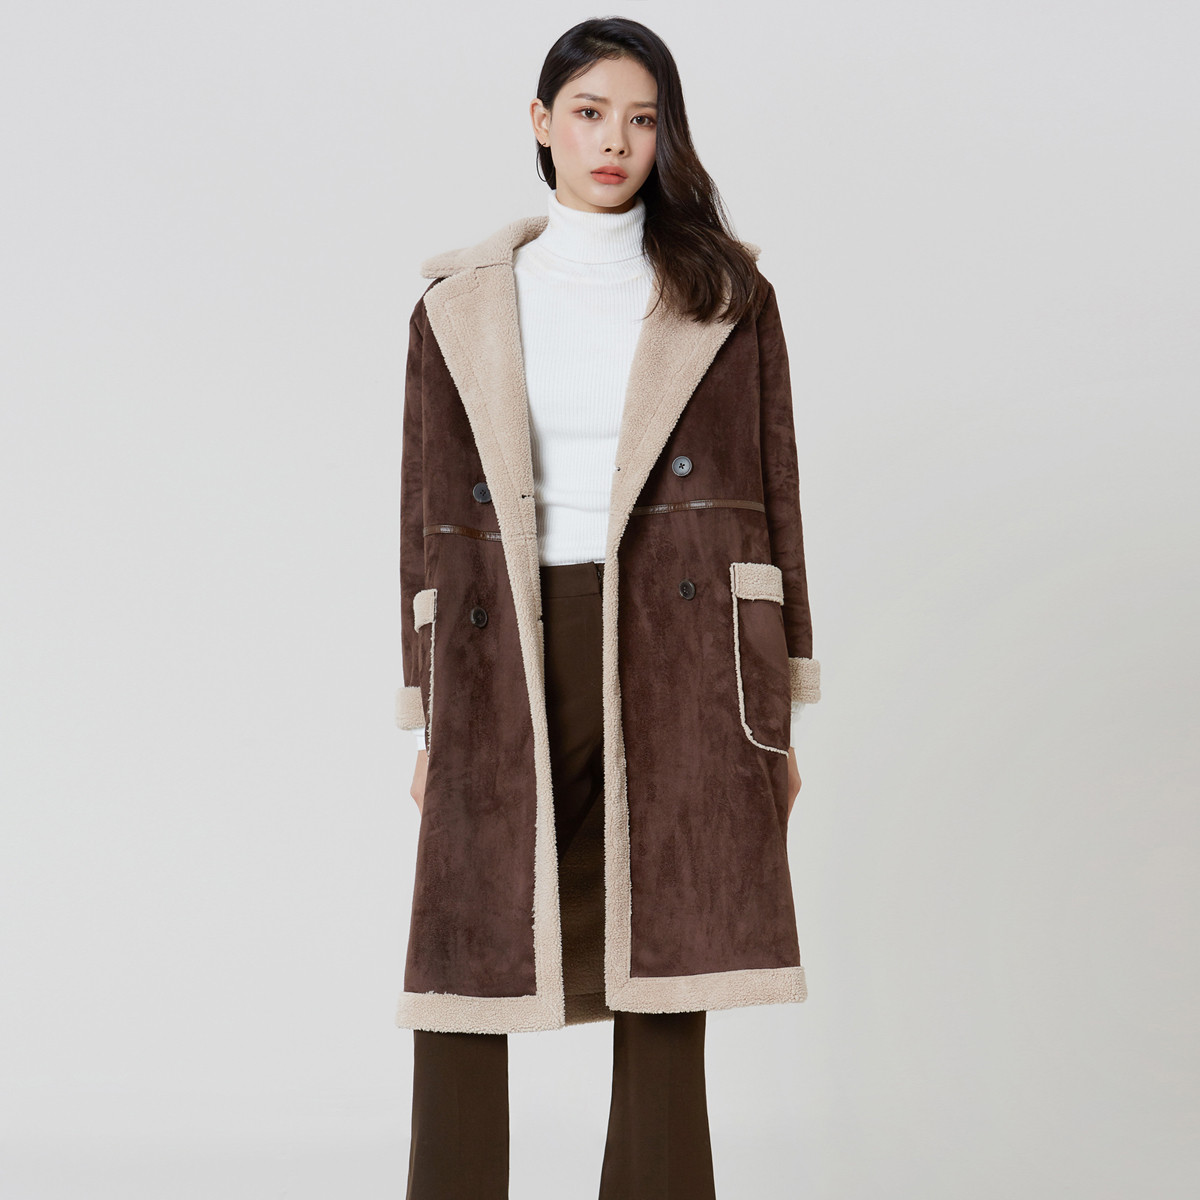 MIXXO秋冬新款韩版通勤休闲显瘦保暖仿麂皮配色加长款翻毛皮夹克外套MIWJL8V31L85